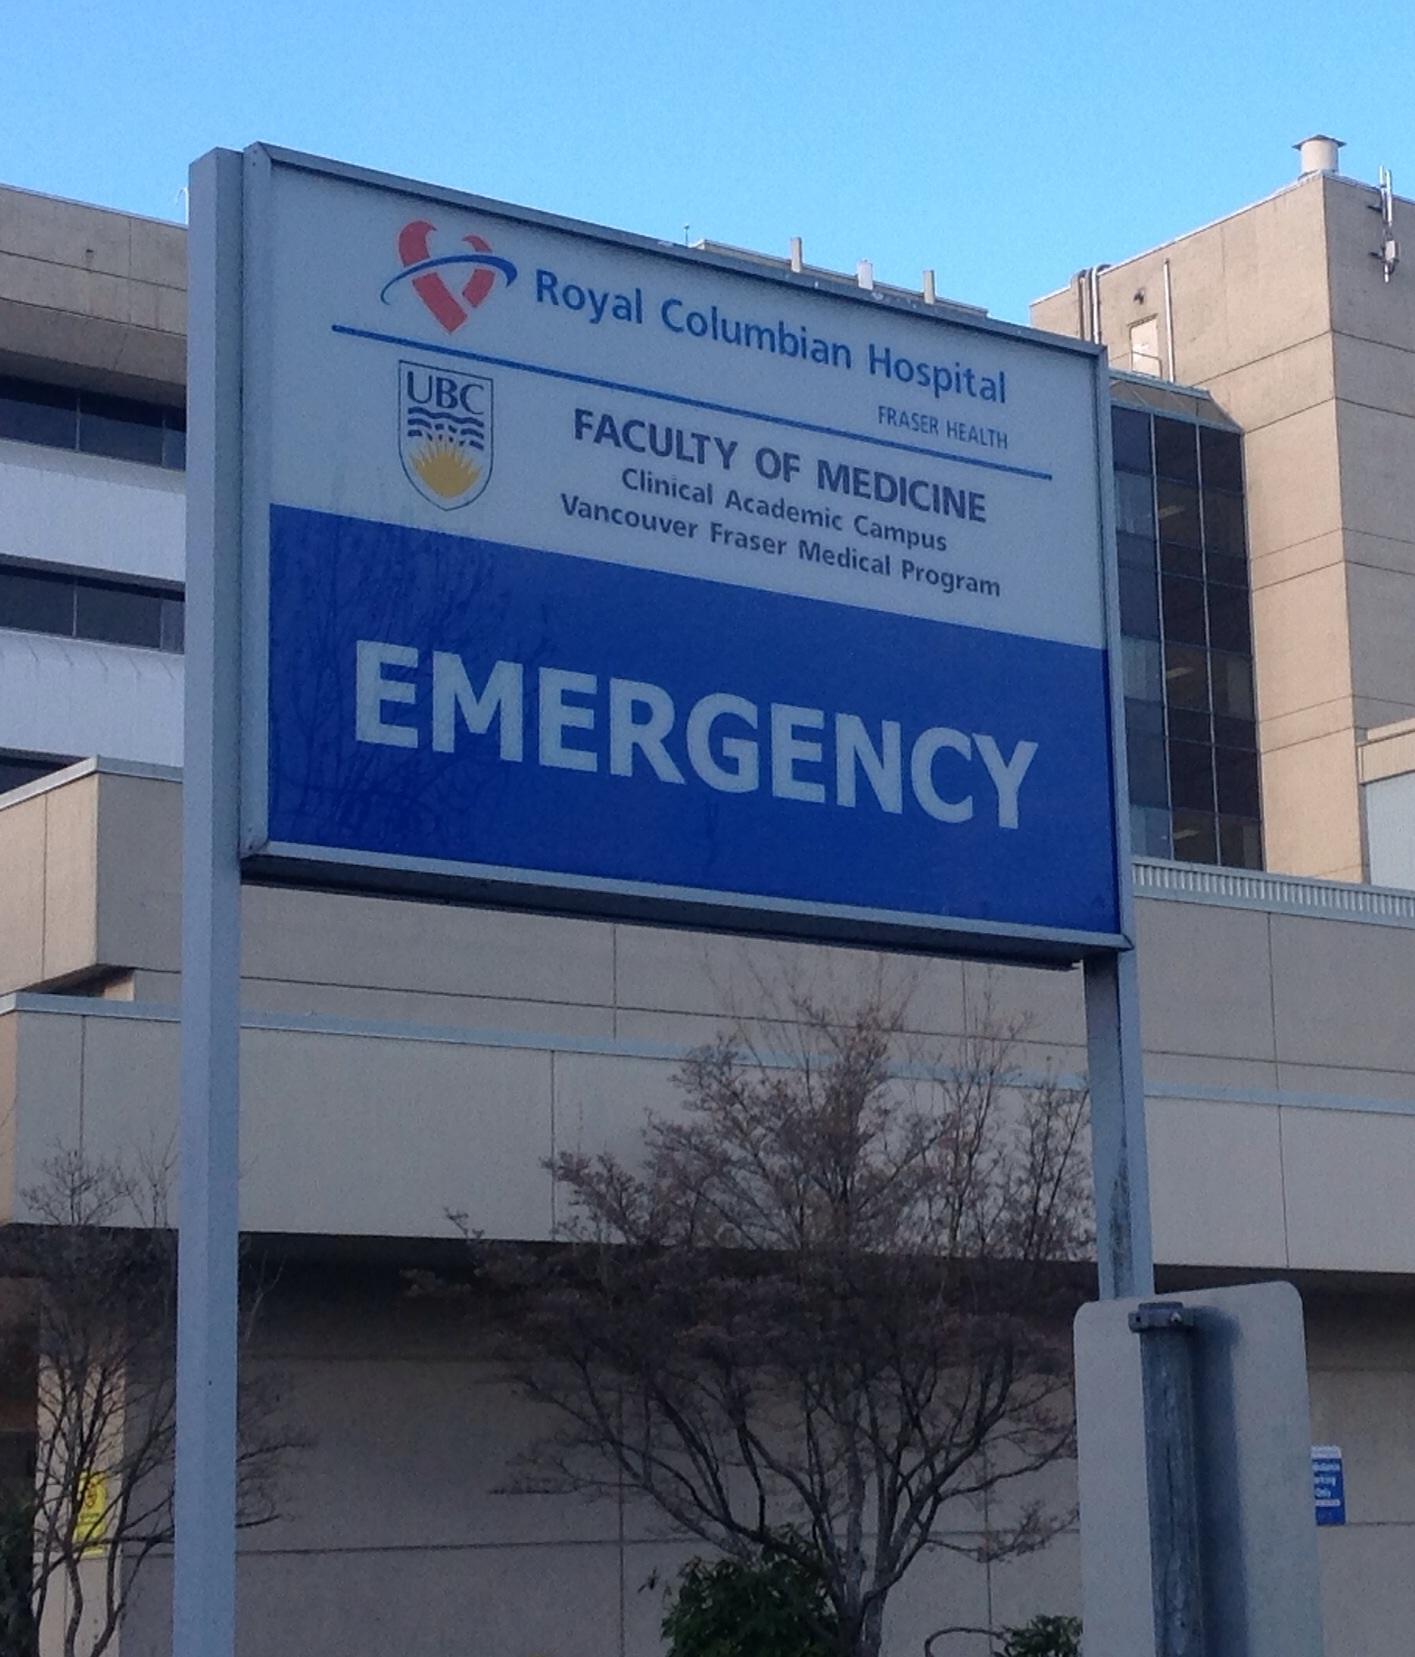 Royal Columbian Hospital Wikipedia